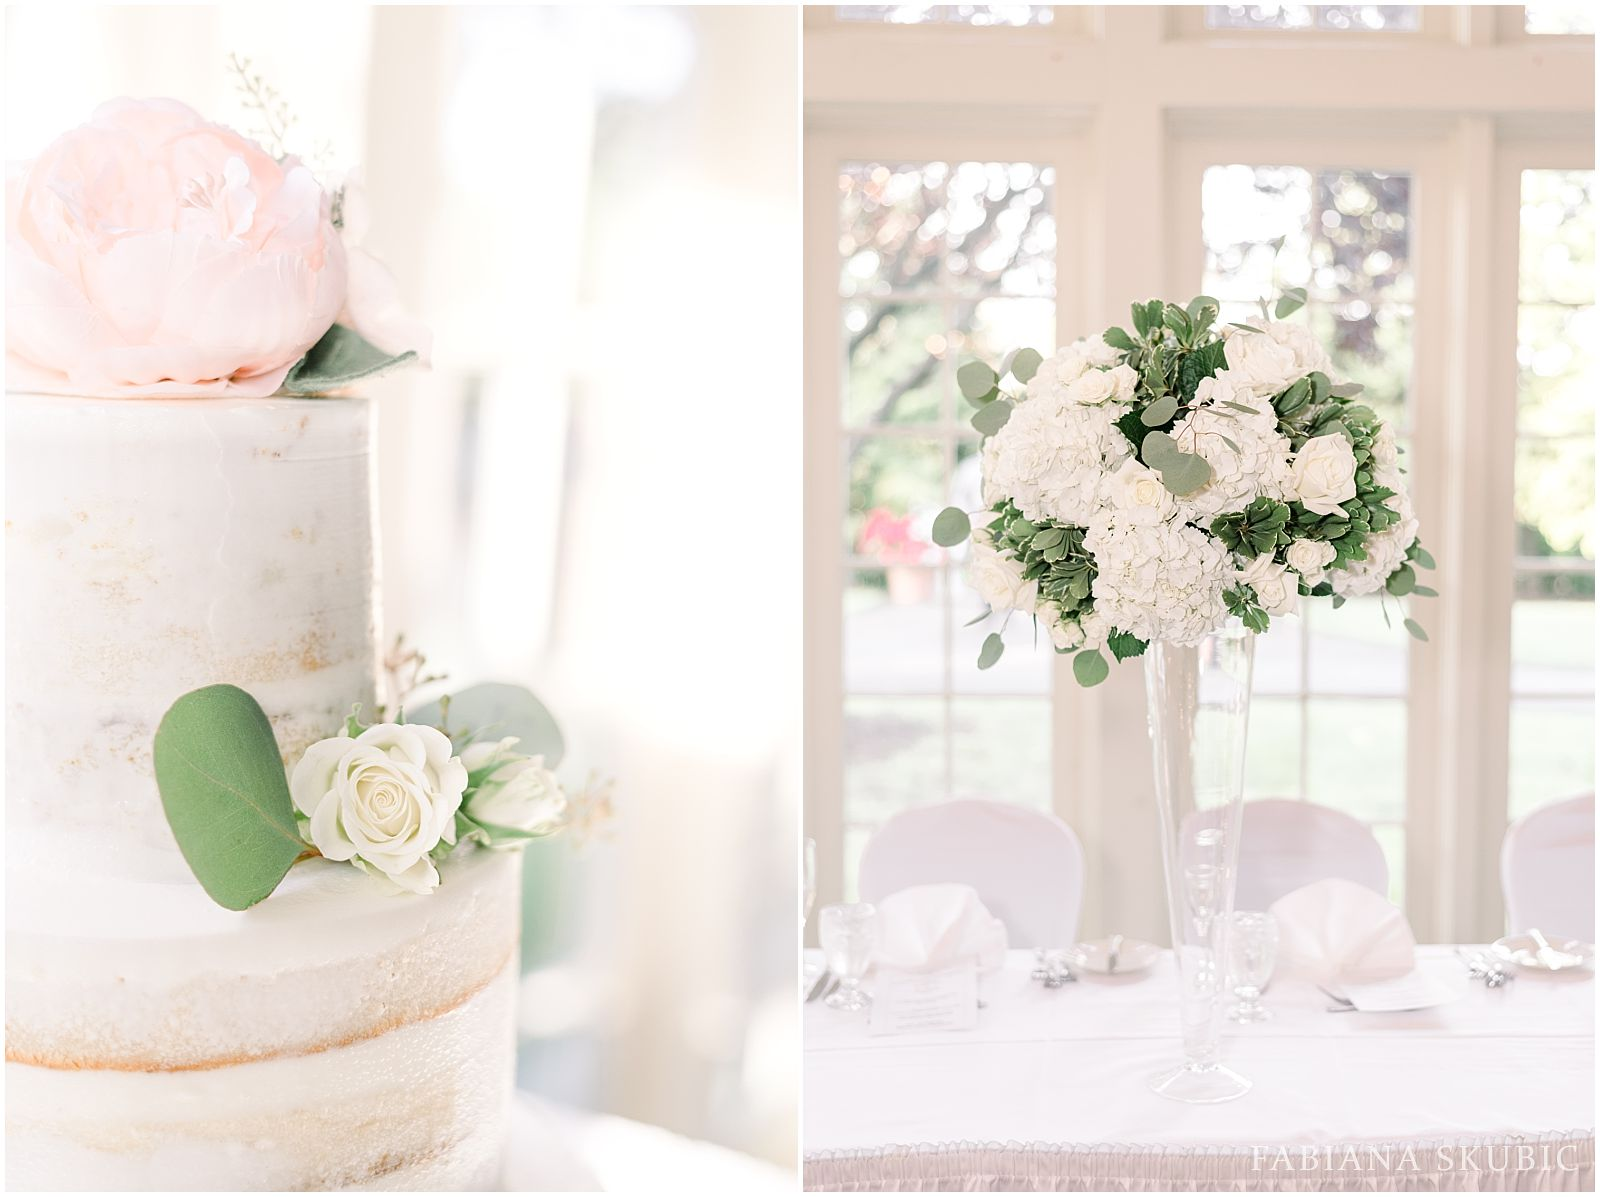 FabianaSkubic_H&M_Wedding_0053.jpg